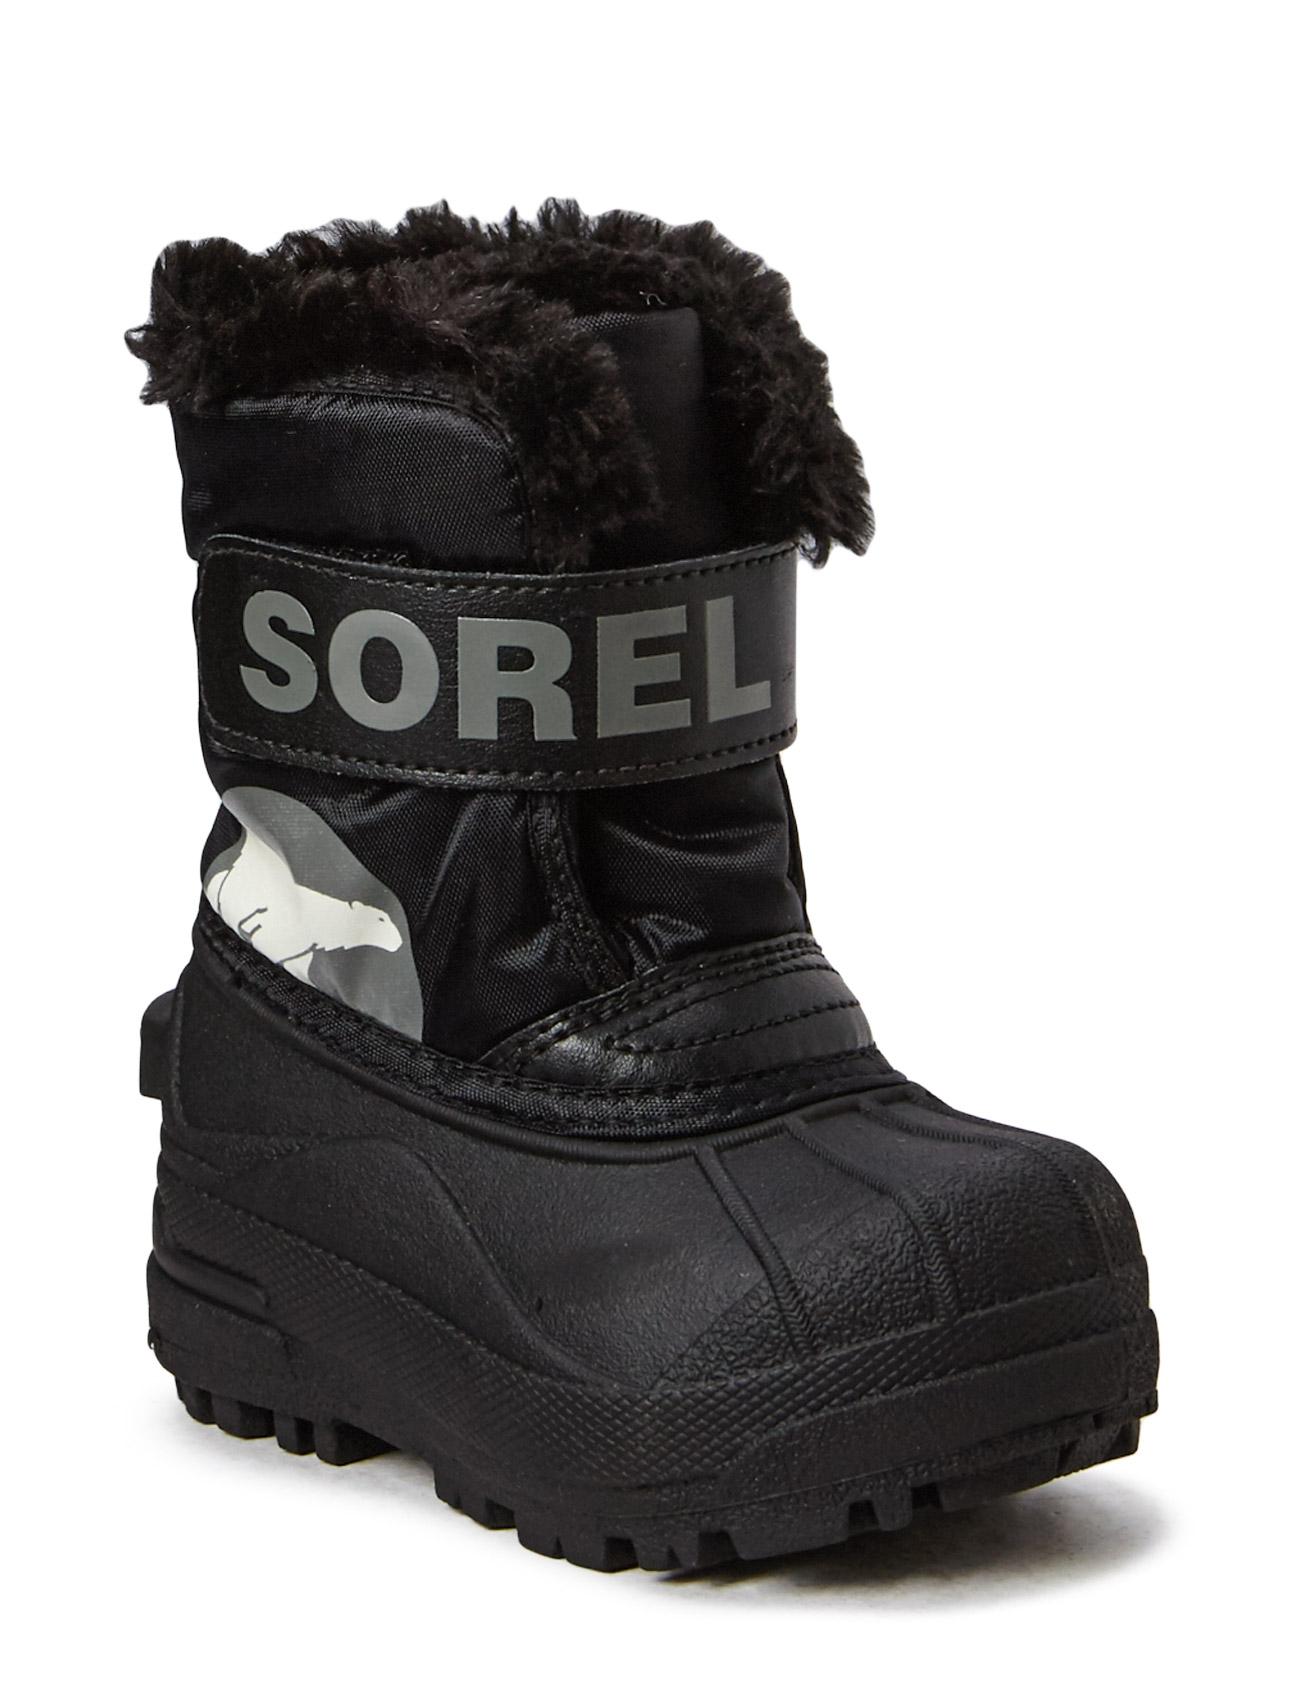 Sorel Toddler's Snow Commander